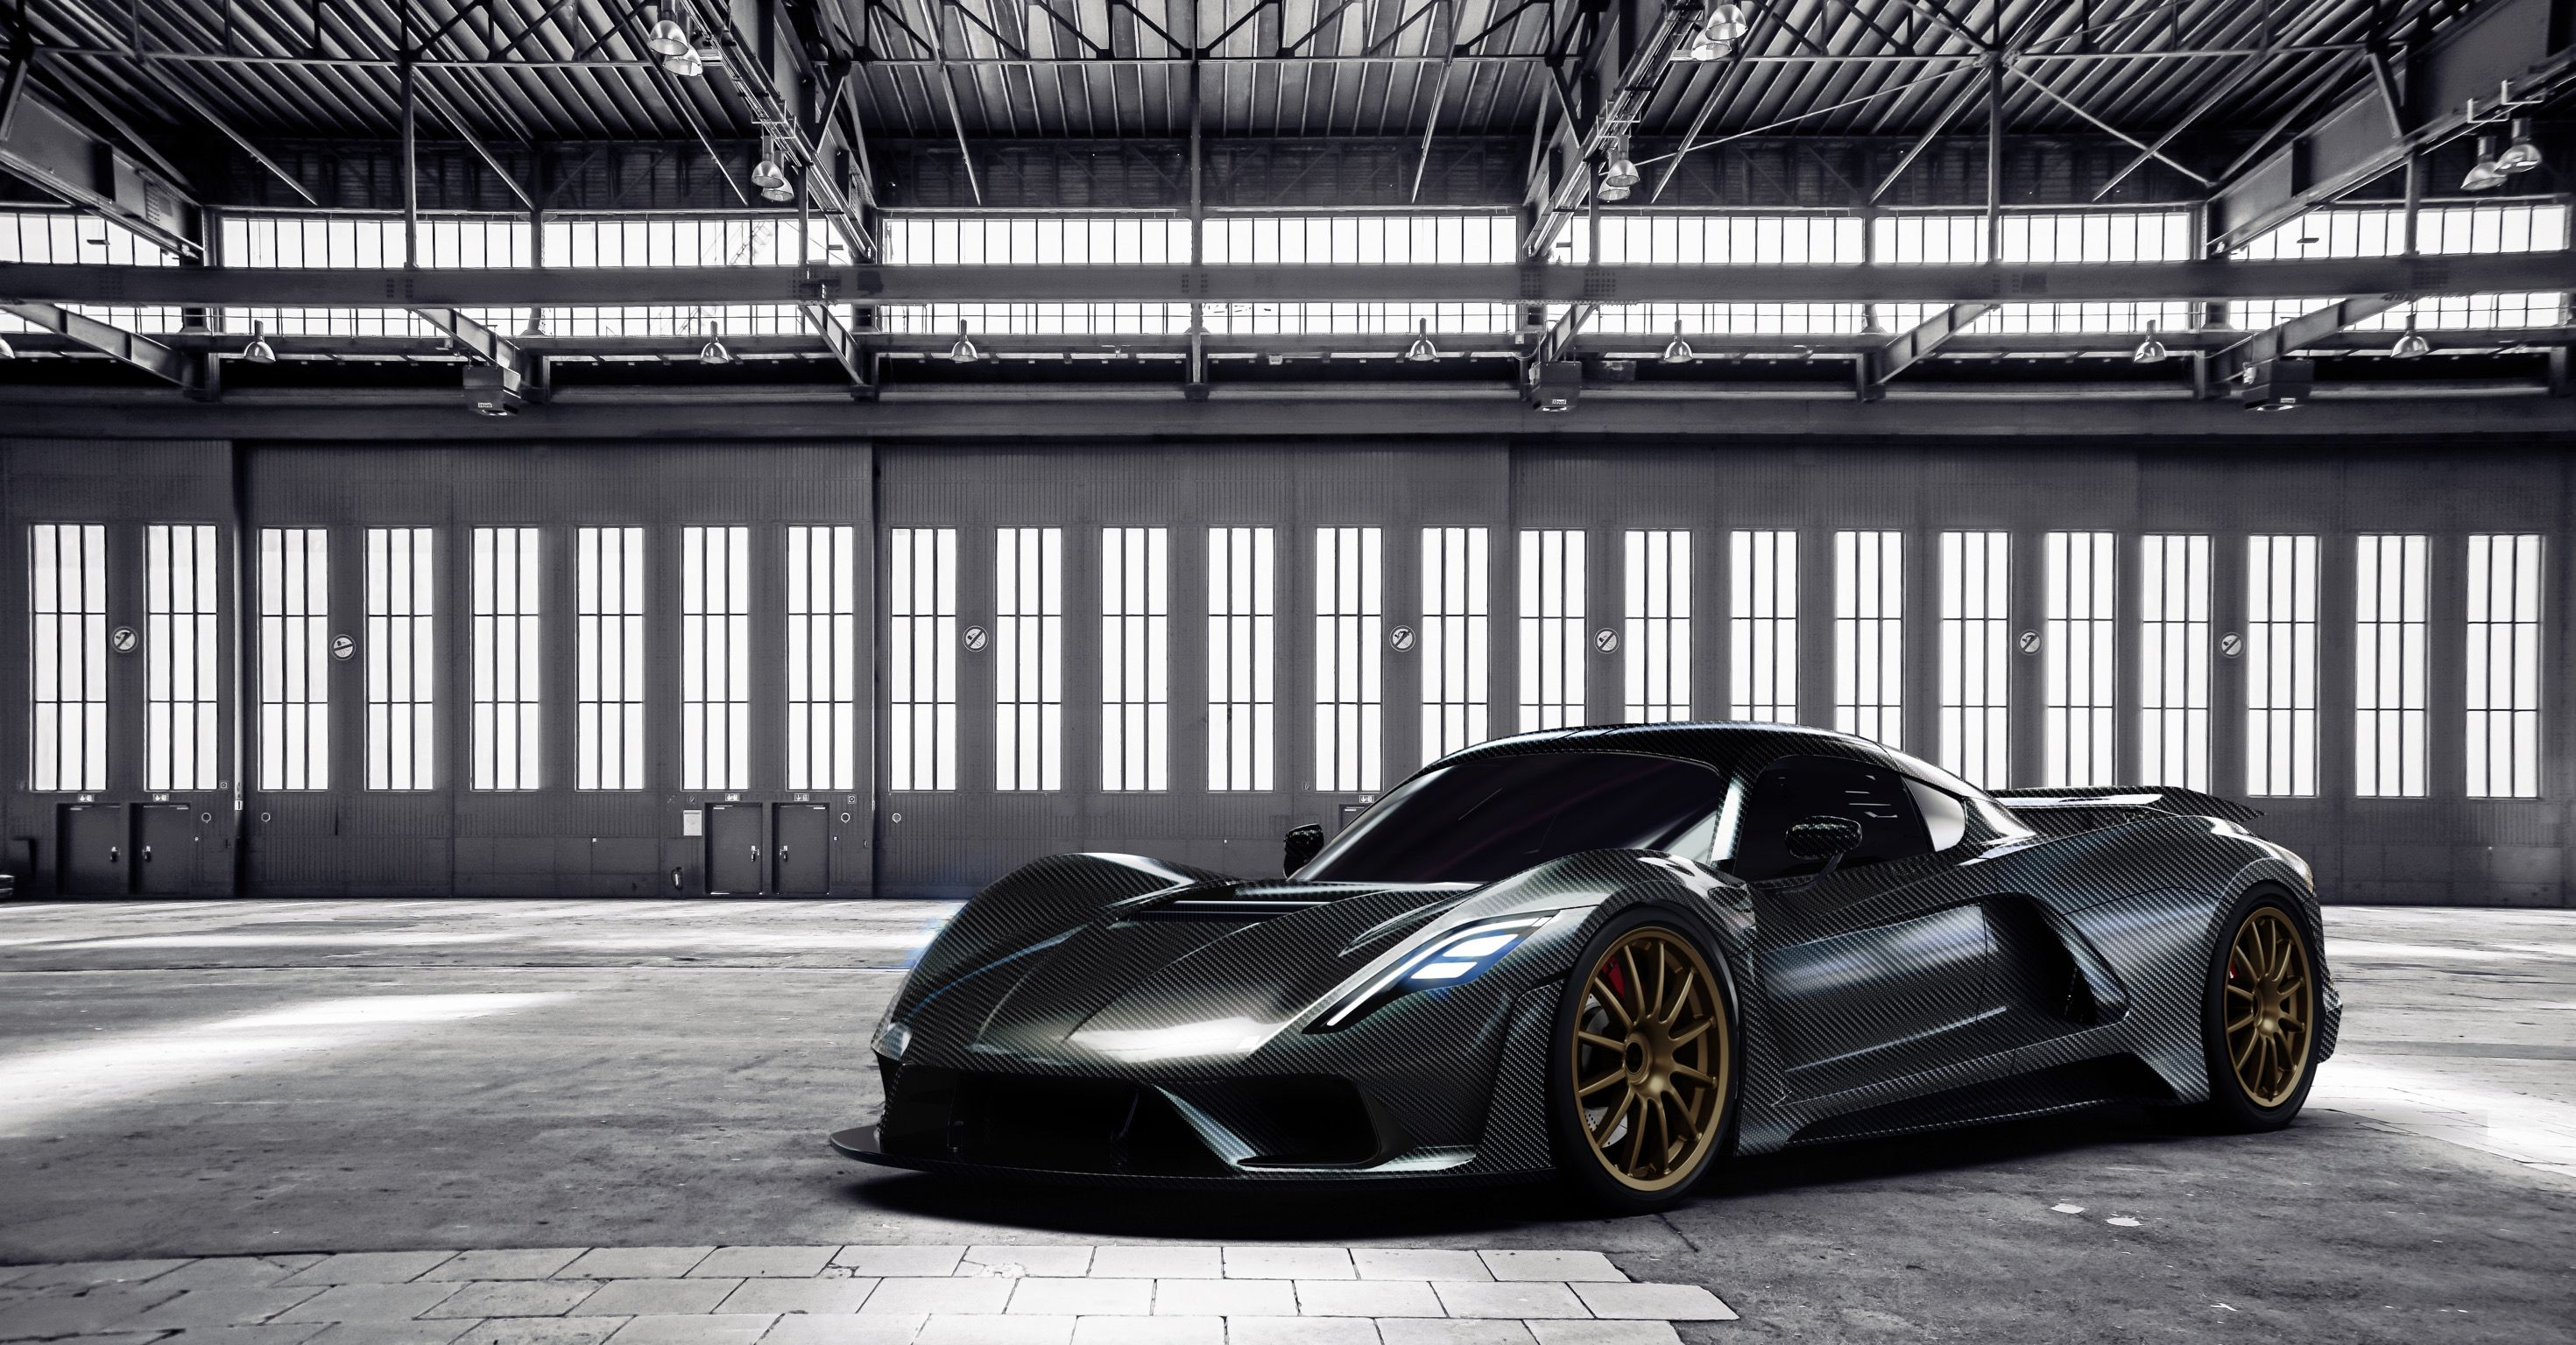 Hennessey Venom F5 Carbon Fiber Body Www Venomf5 Com Hennessey Rear View Rear View Mirror